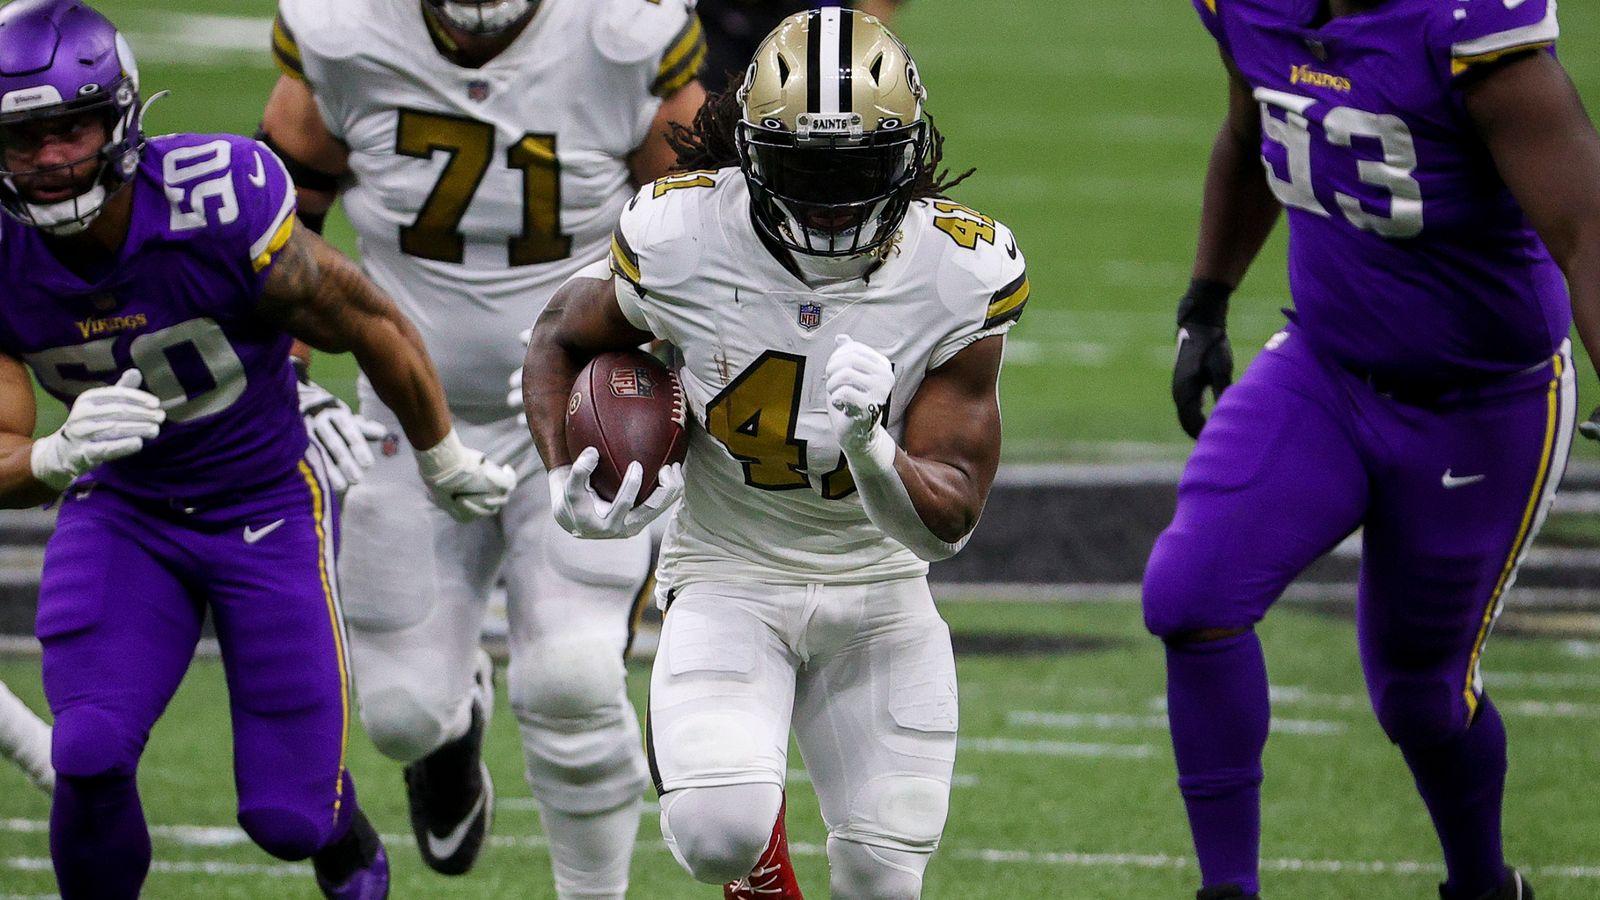 Minnesota Vikings 33-52 New Orleans Saints: Alvin Kamara runs riot in Christmas Day bonanza